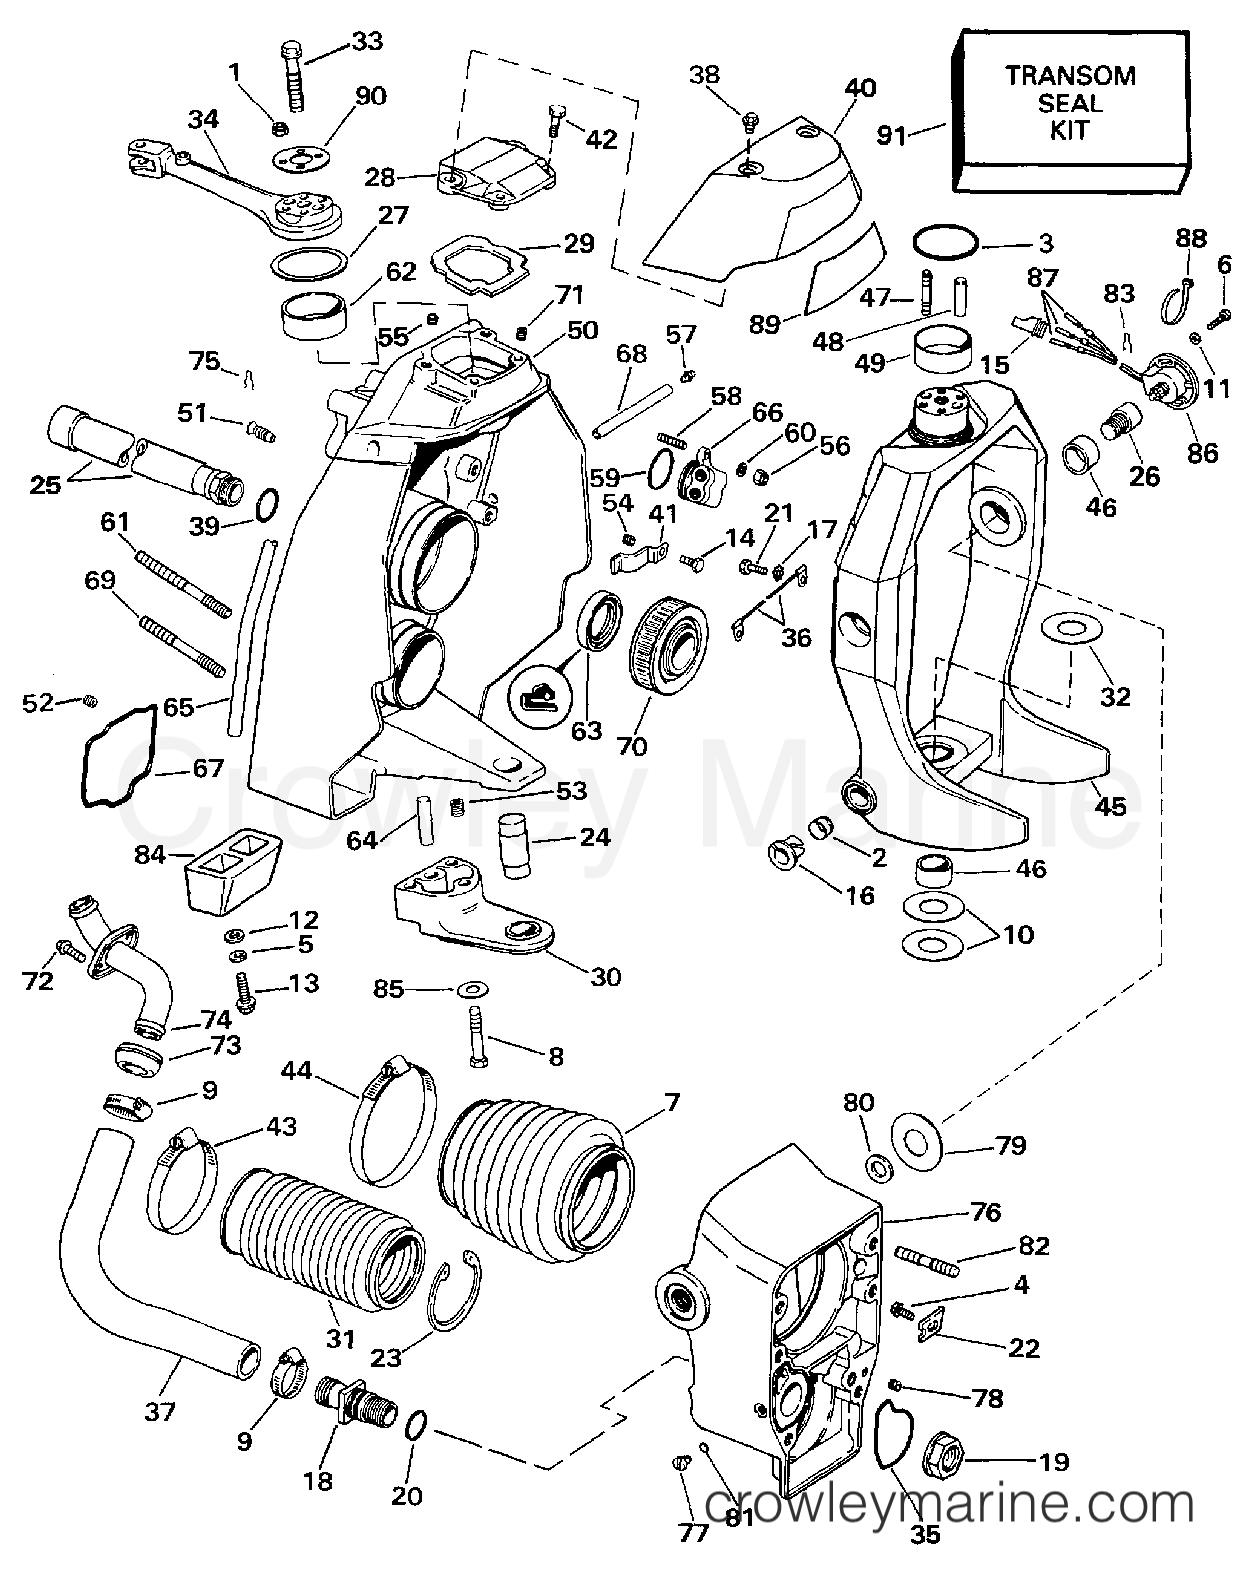 1997 OMC Stern Drive 7.4 - 744FPLKD TRANSOM MOUNT section